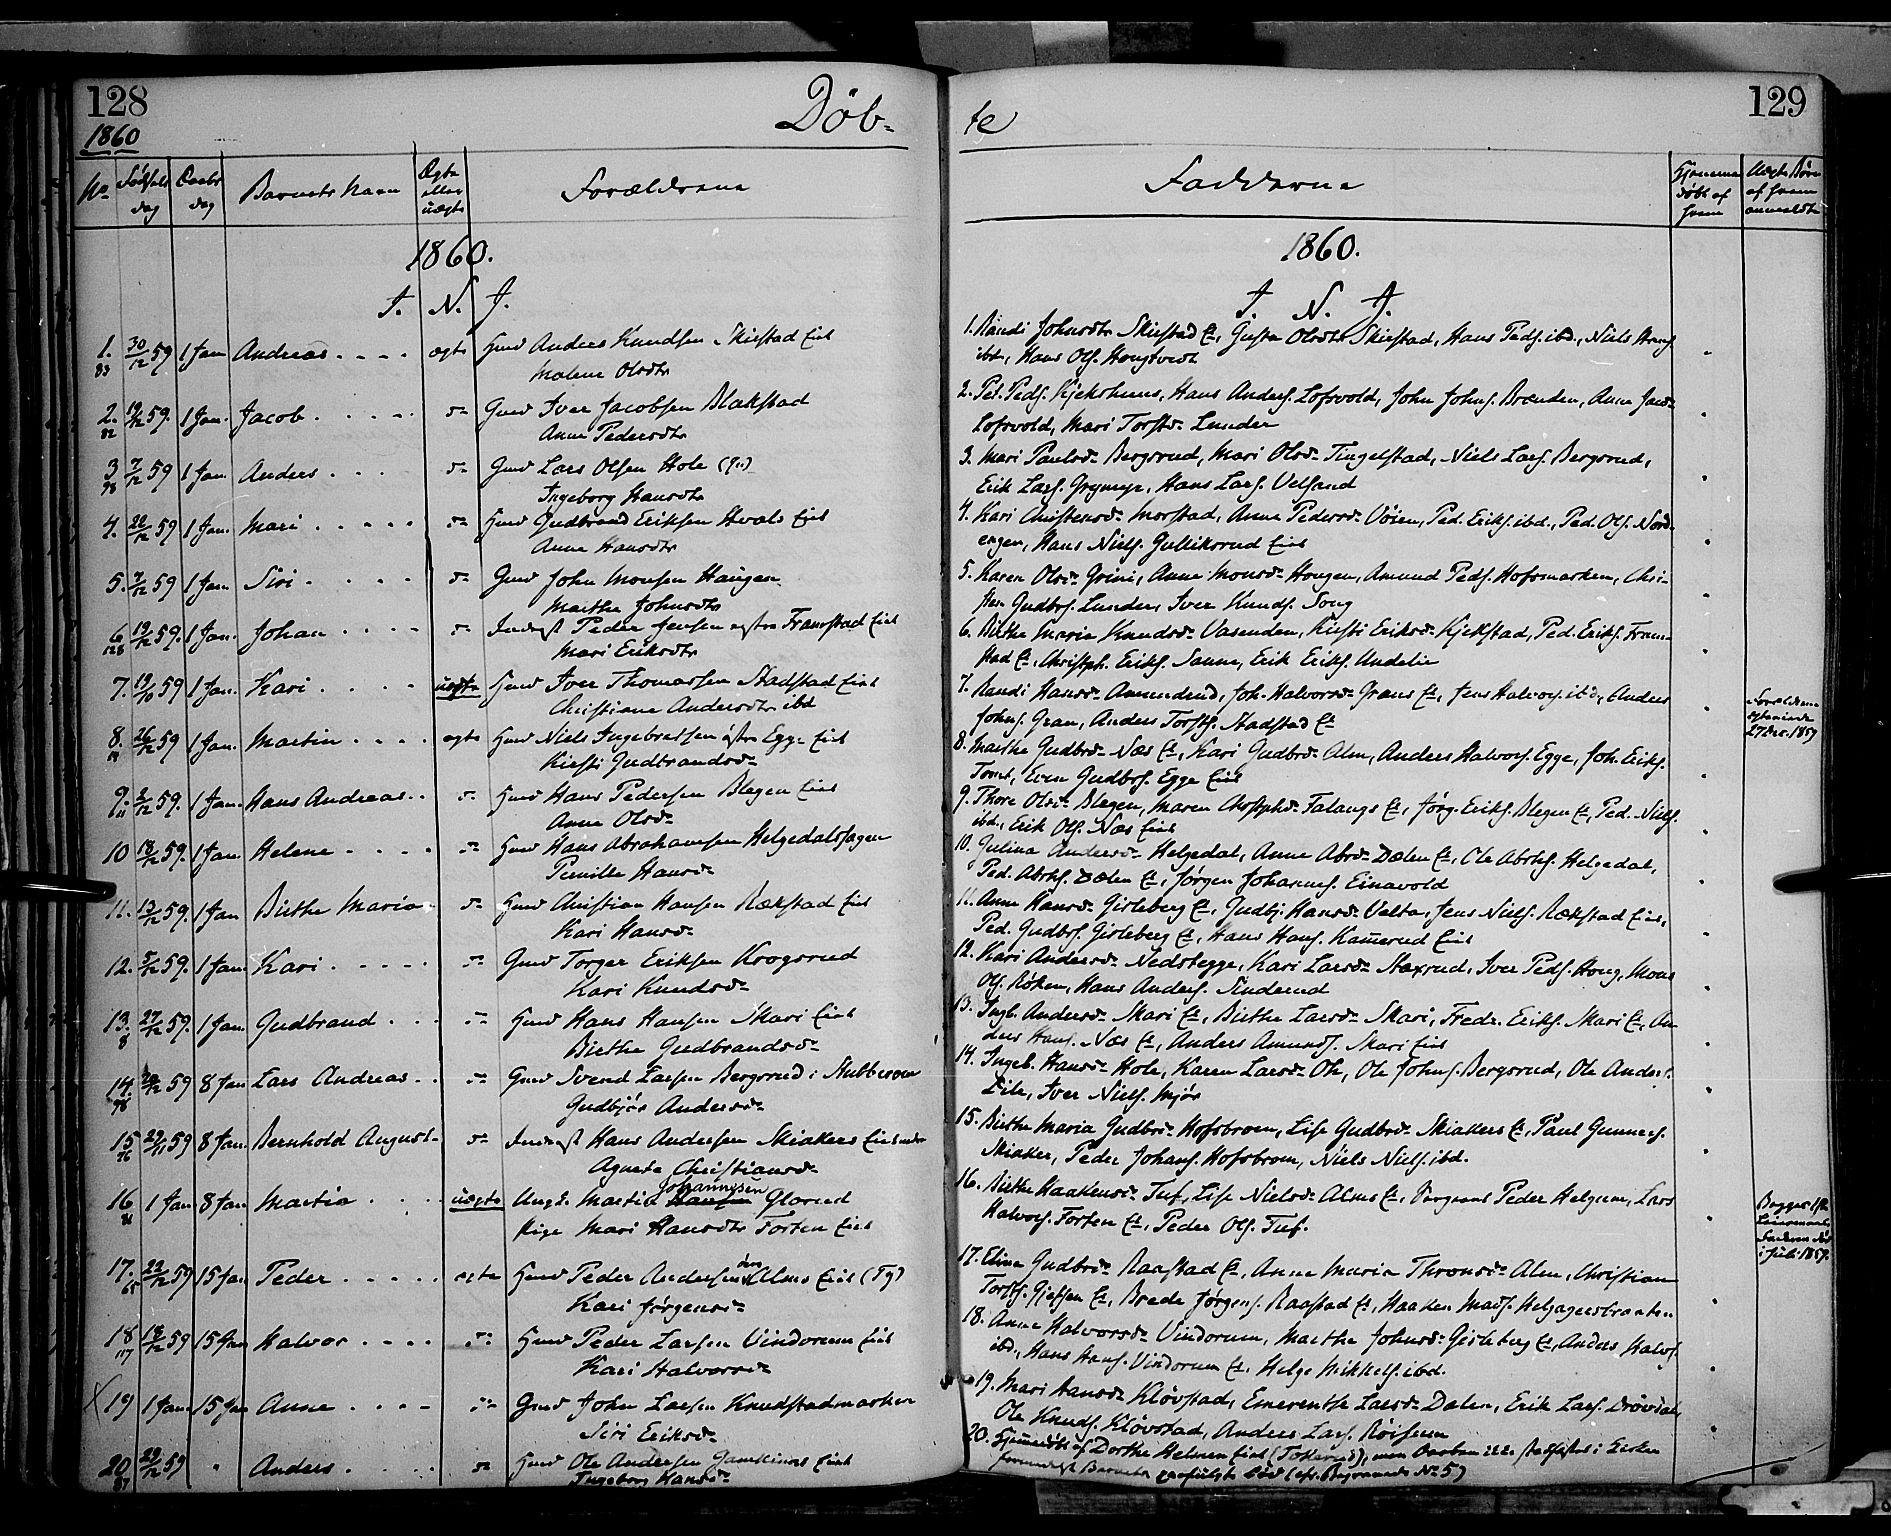 SAH, Gran prestekontor, Ministerialbok nr. 12, 1856-1874, s. 128-129